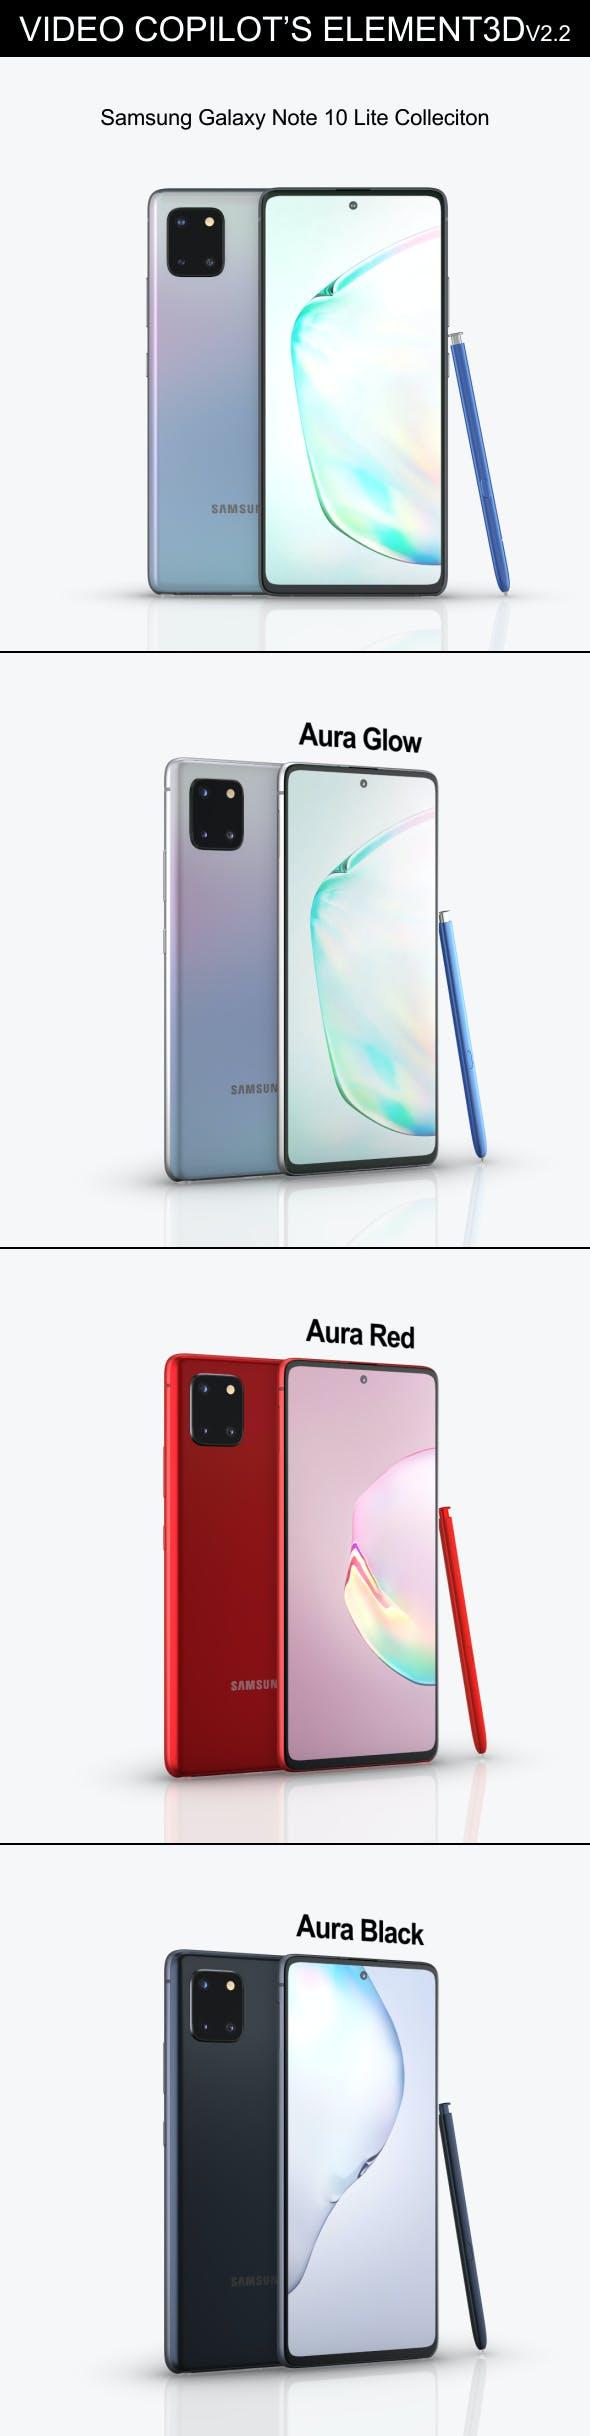 Element3D - Samsung Galaxy Note 10 Lite - 3DOcean Item for Sale